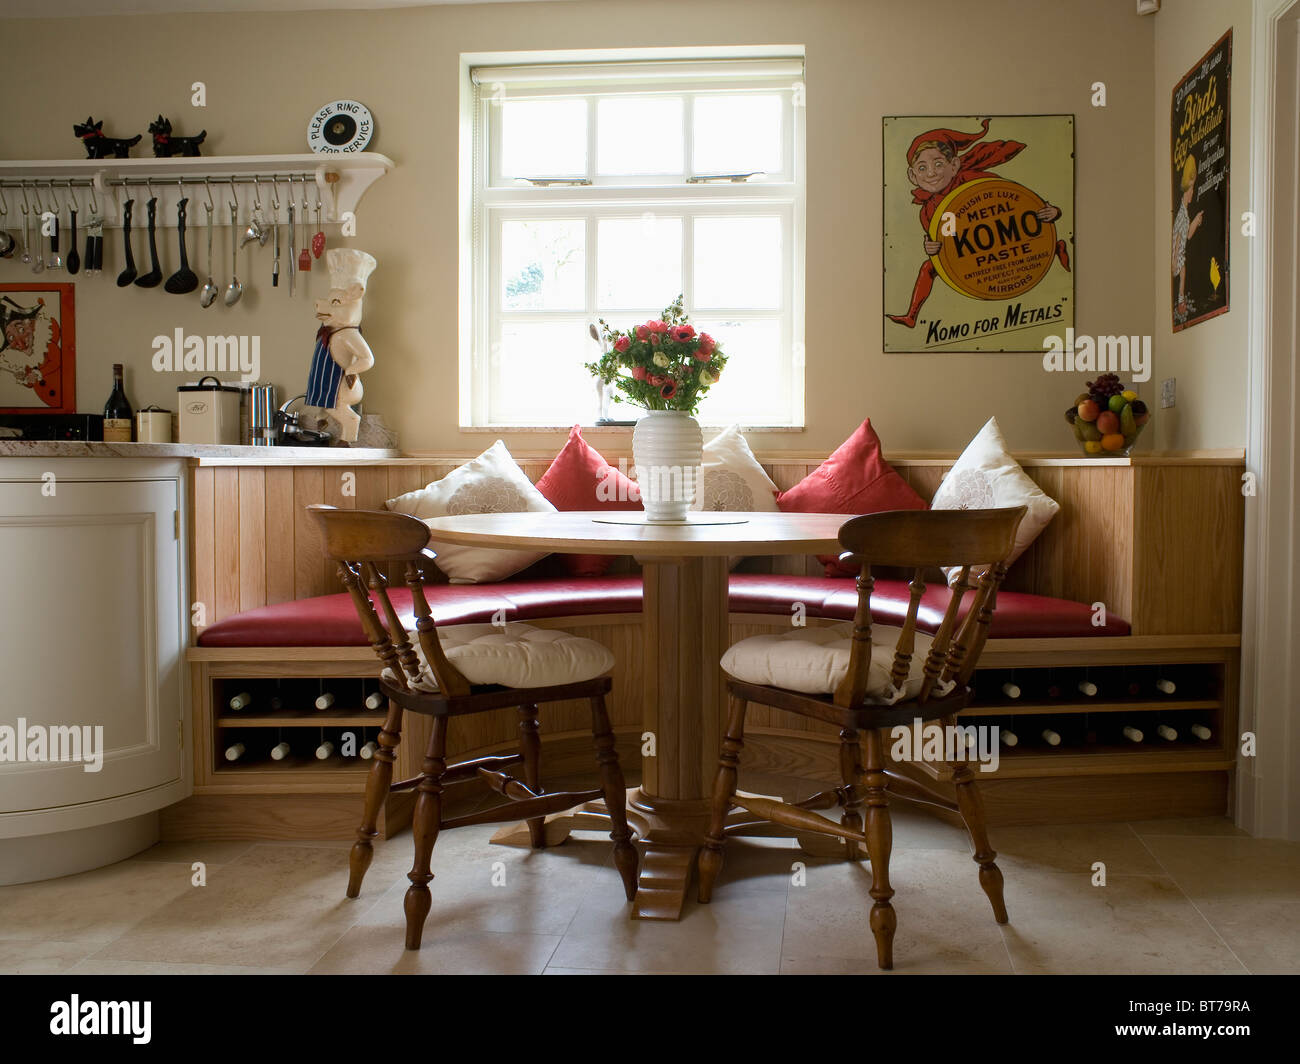 Tavole E Sedie Da Cucina.Tavola Circolare E Sedie Di Legno In Cucina Sala Da Pranzo Camera